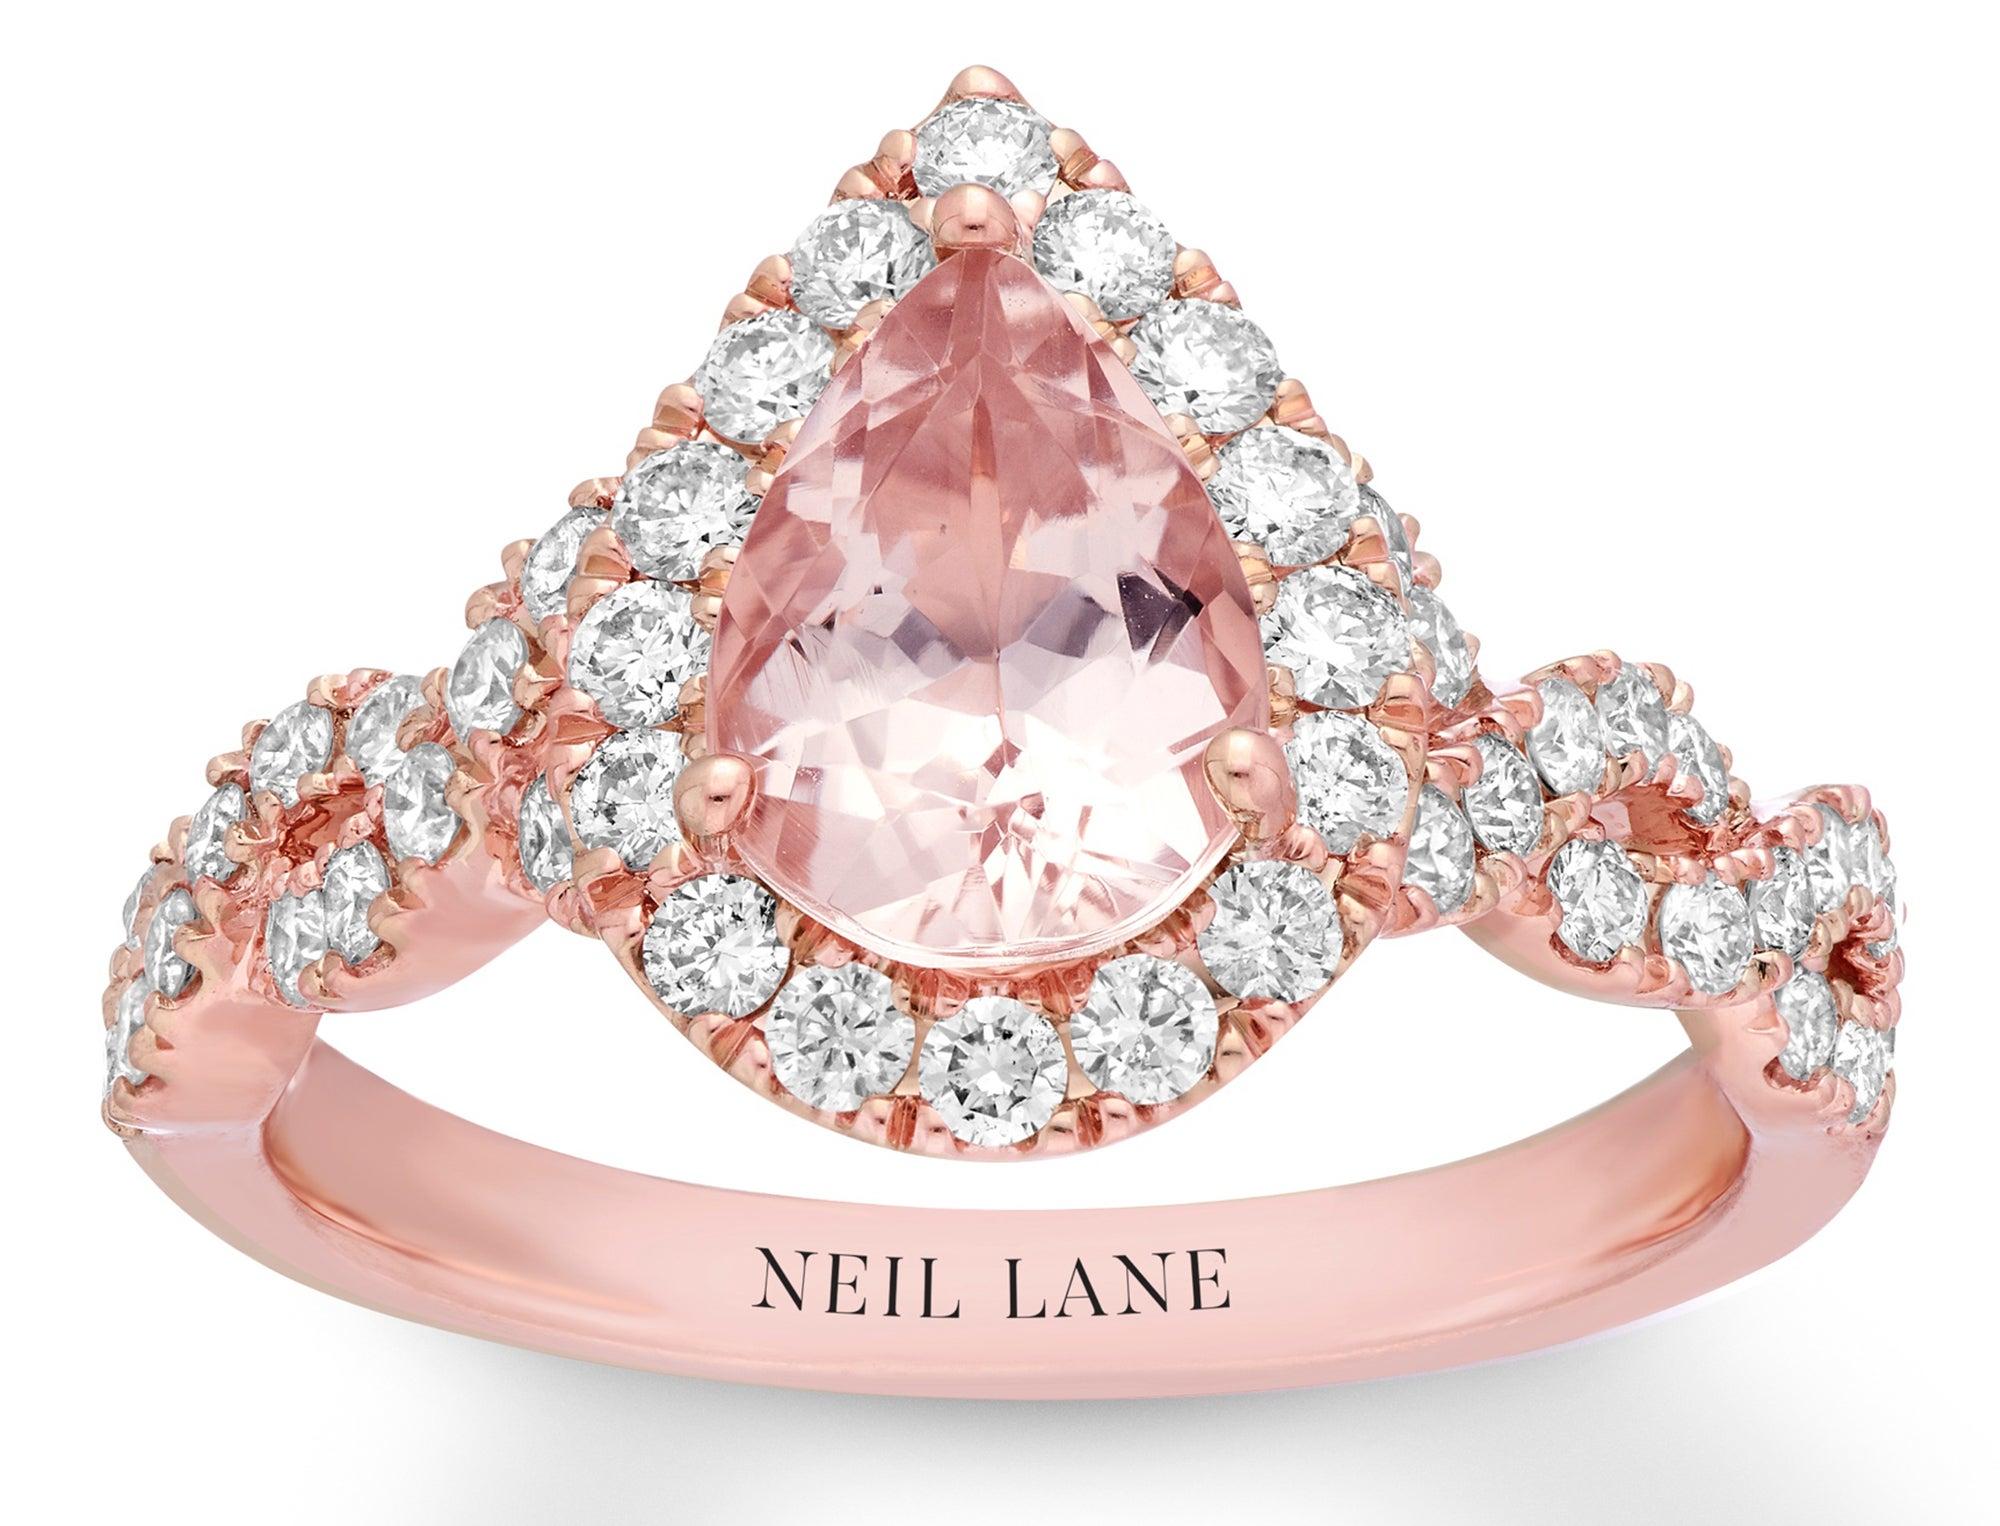 Neil Lane 14k Gold Morganite Engagement Ring